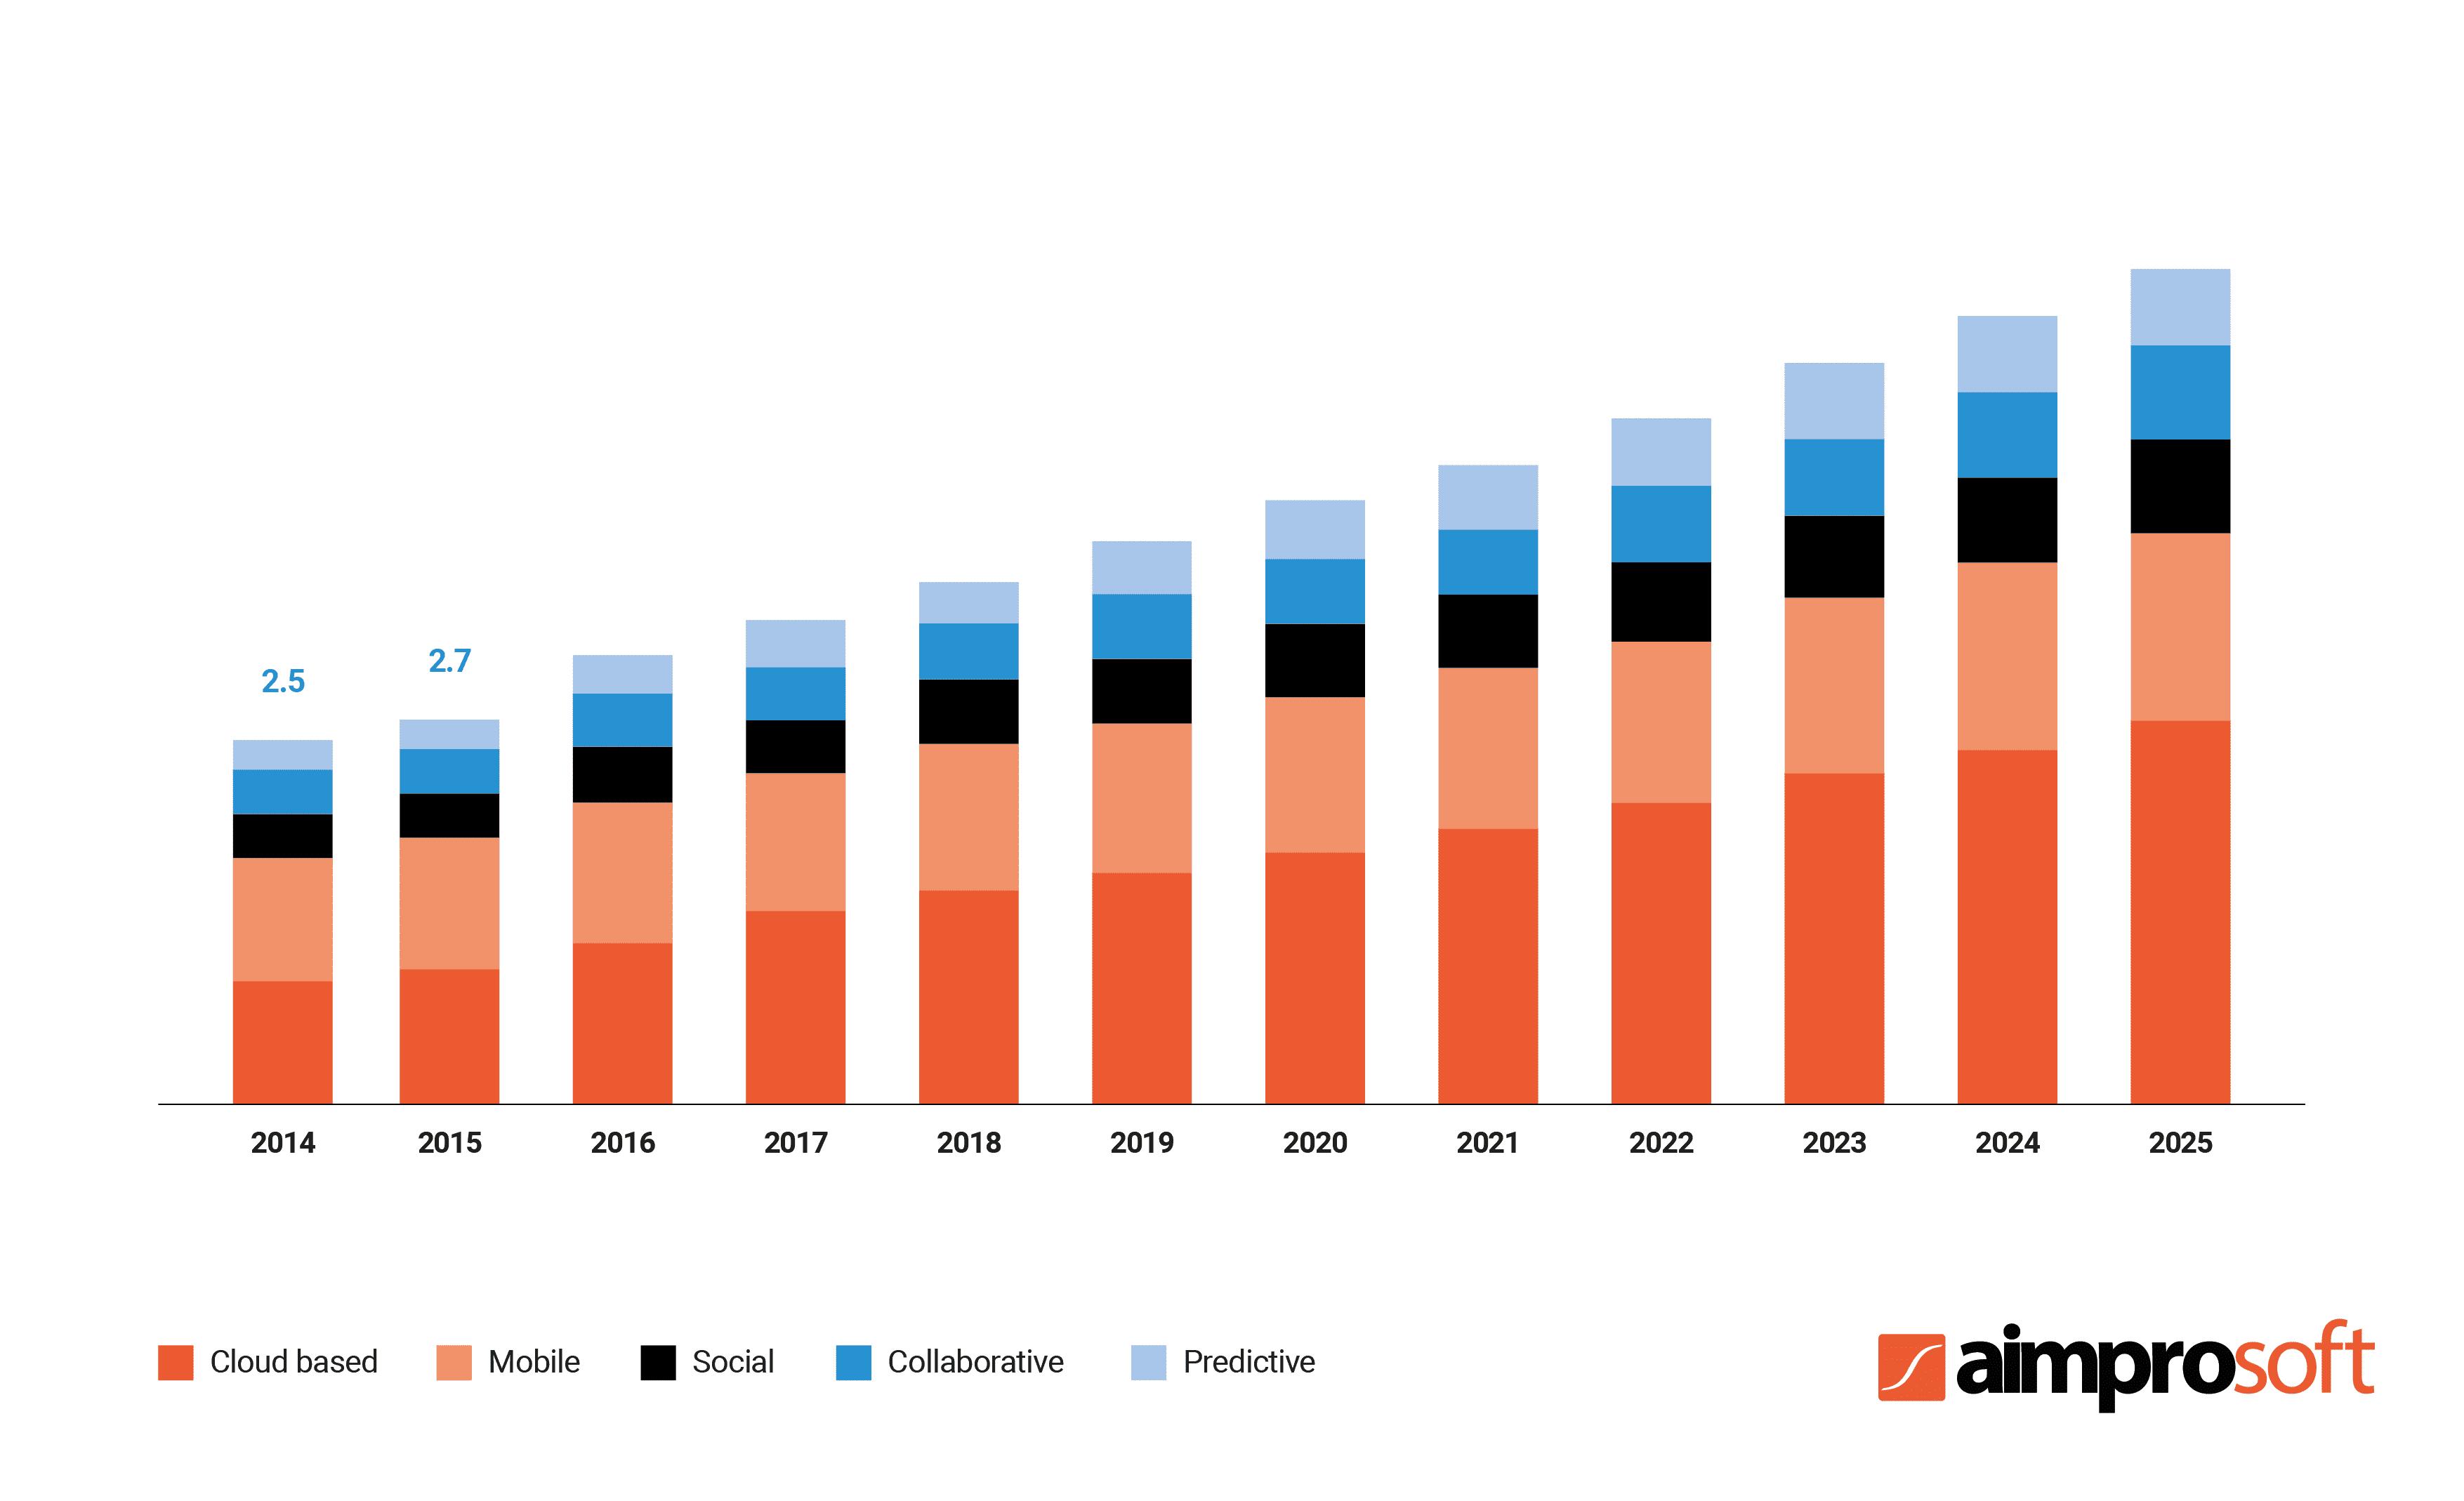 Medical CRM market revenue (2014-2025)